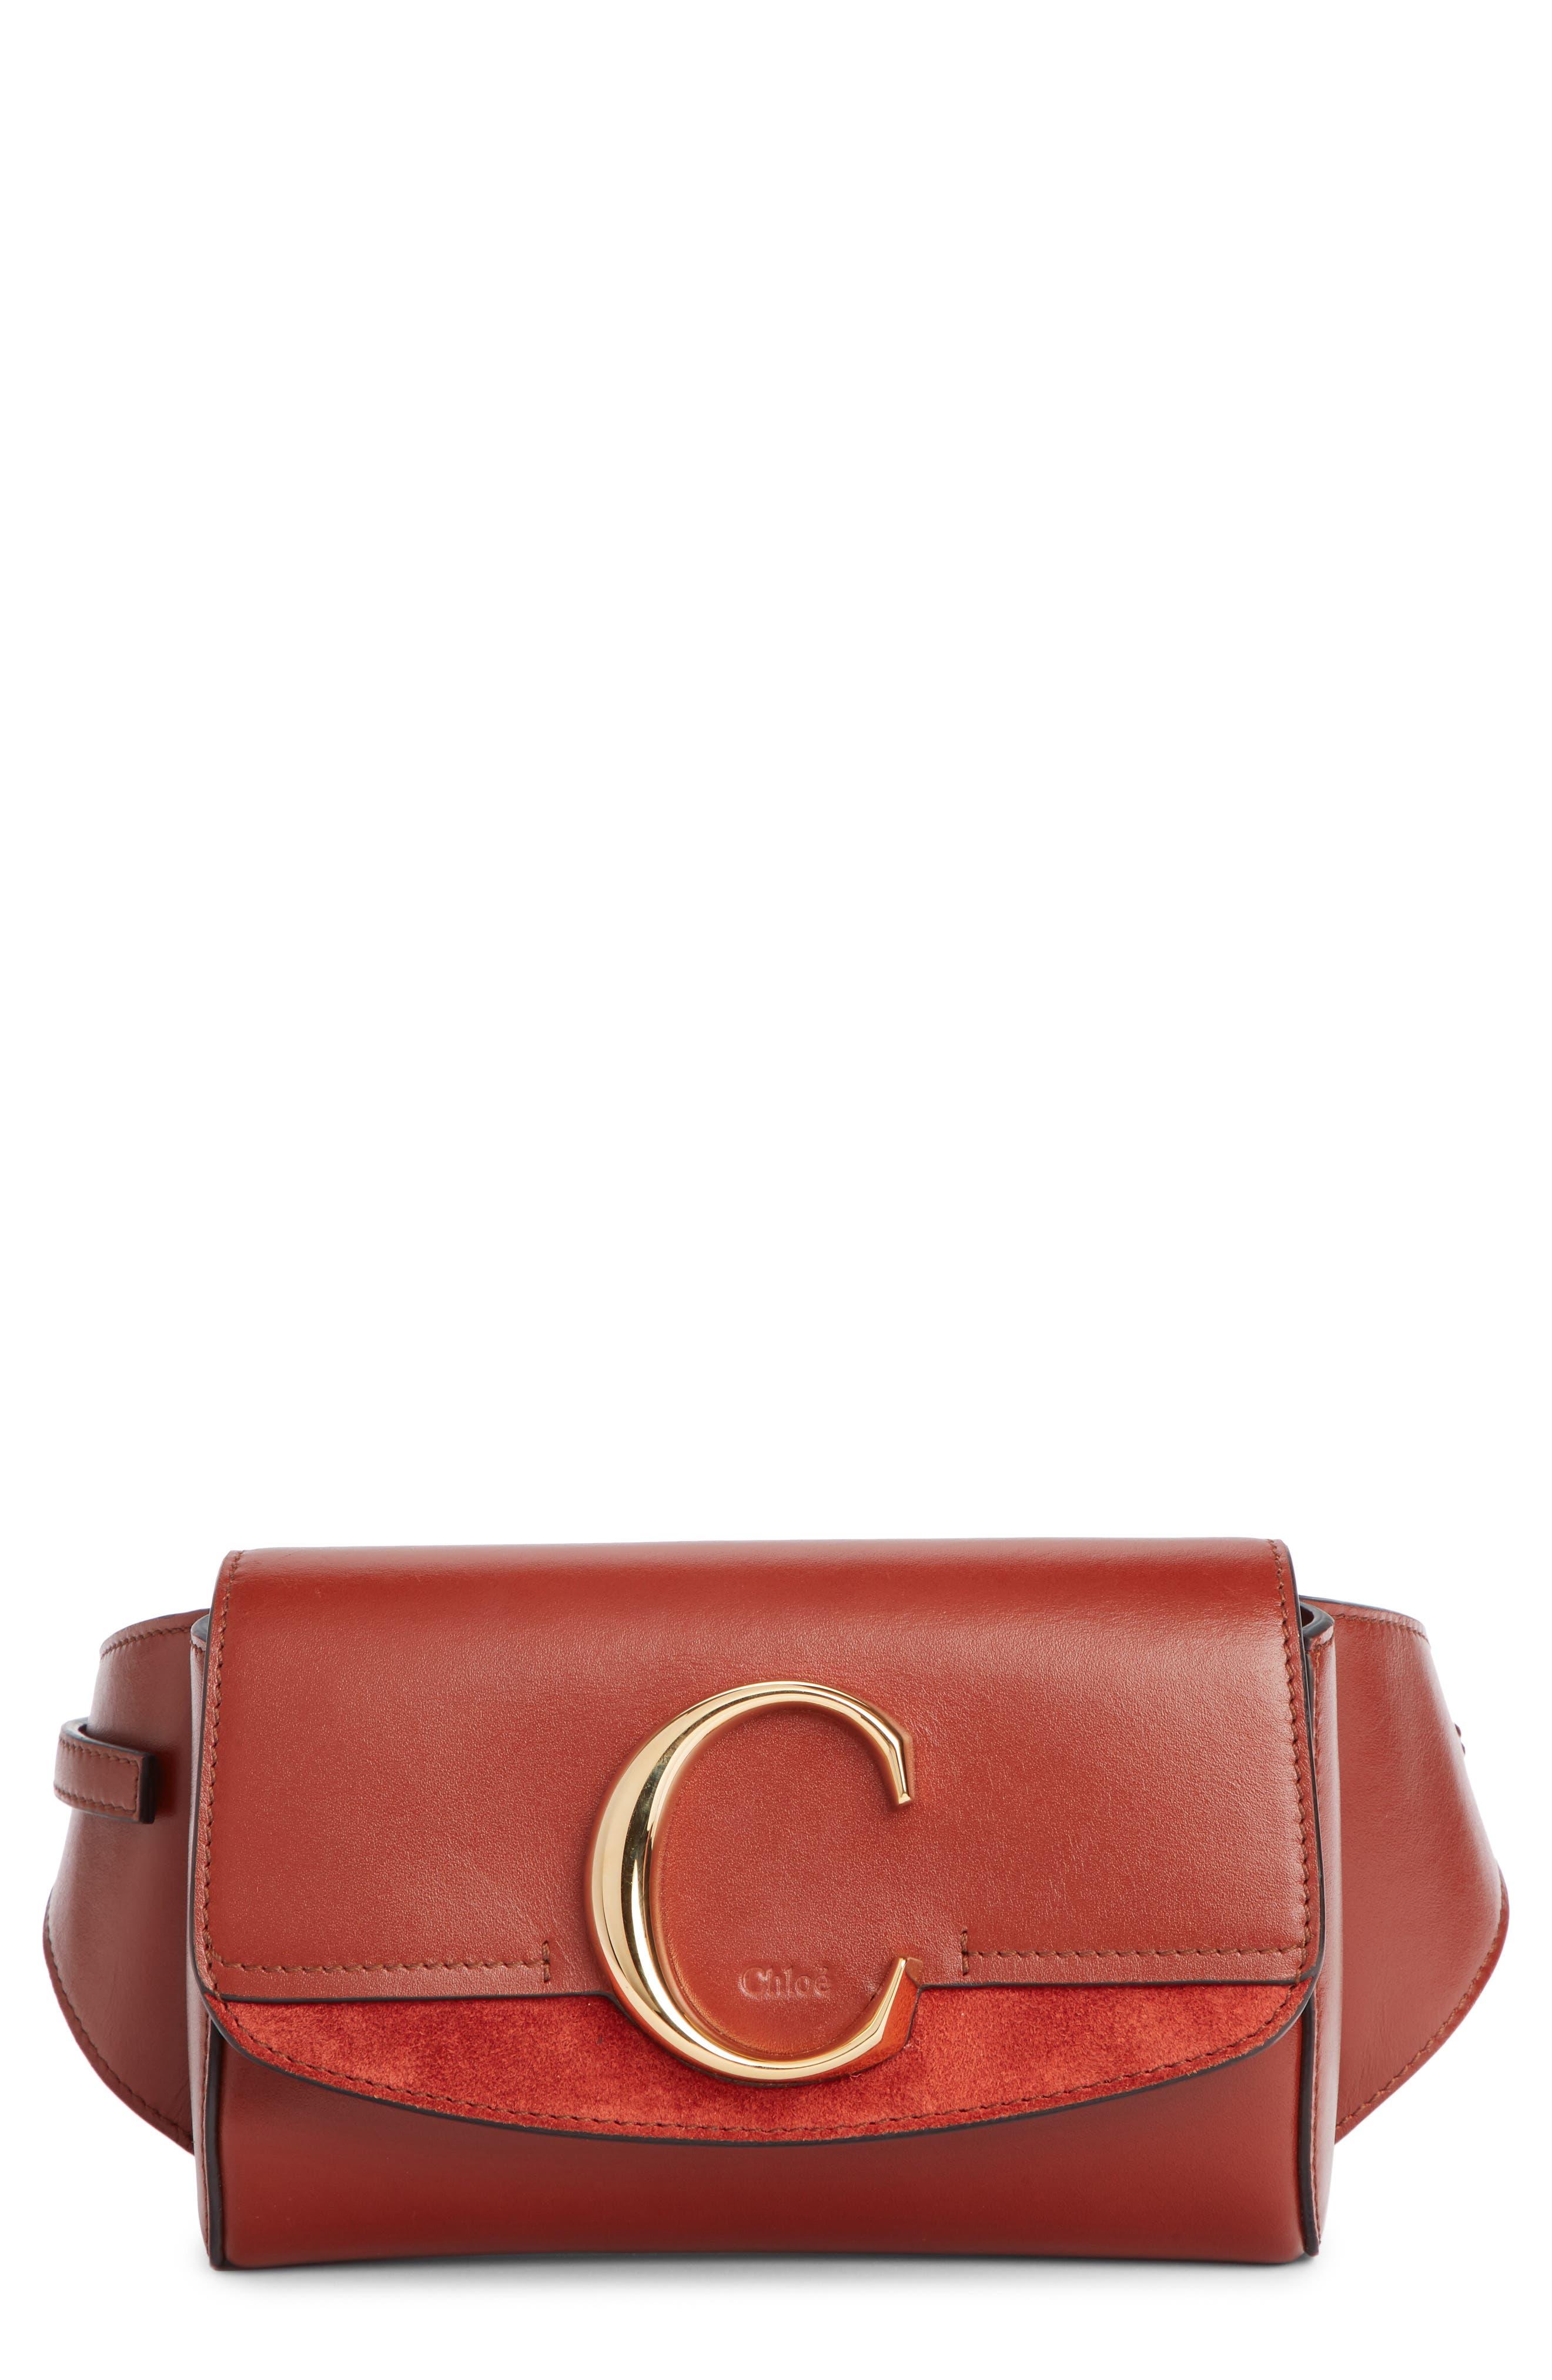 CHLOÉ C Leather Convertible Belt Bag, Main, color, SEPIA BROWN